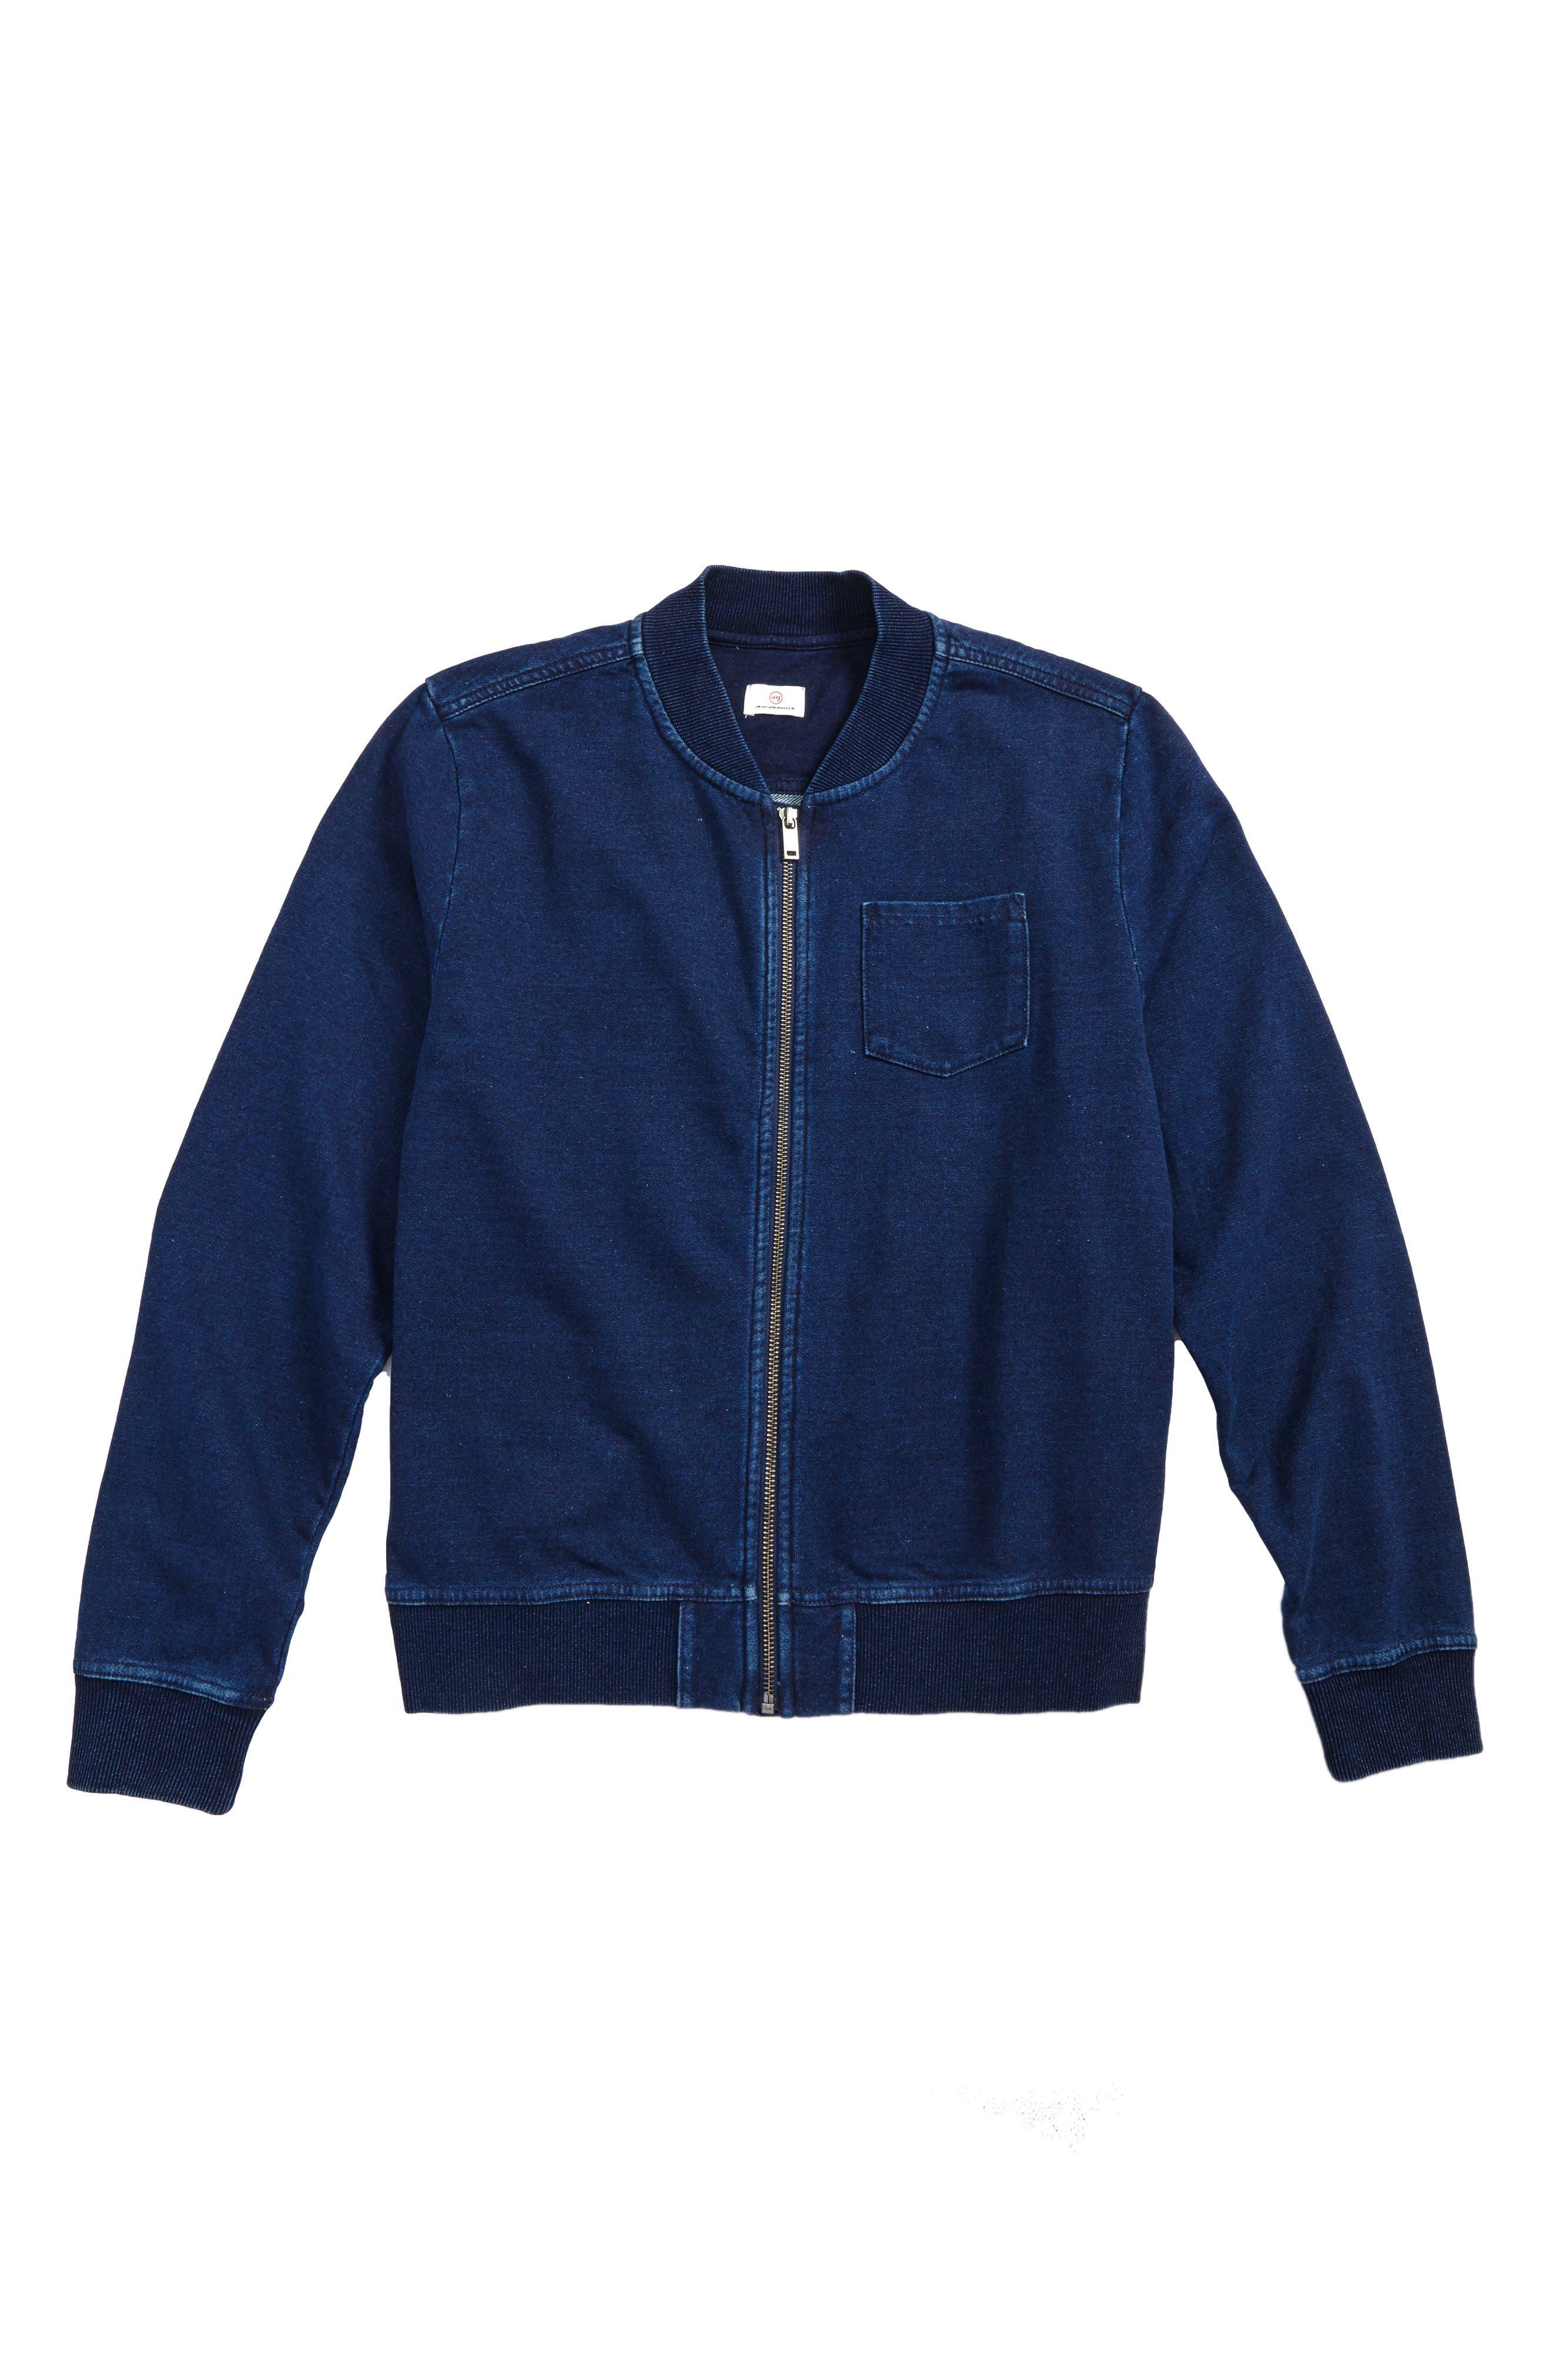 AG Jersey Fleece Bomber Jacket,                             Main thumbnail 1, color,                             Indigo